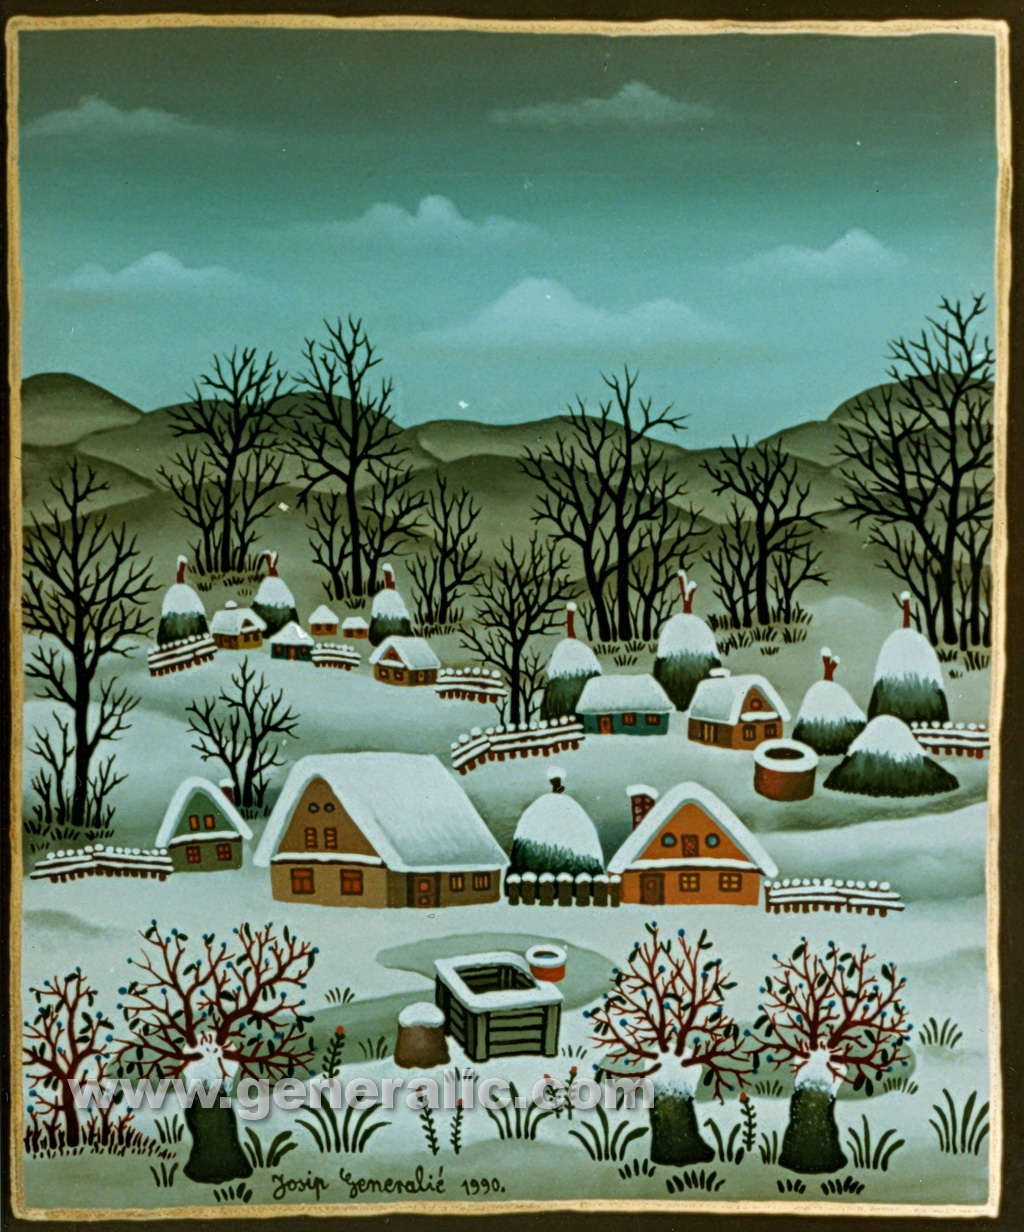 Josip Generalic, 1990, Winter, oil on glass, 28x23 cm